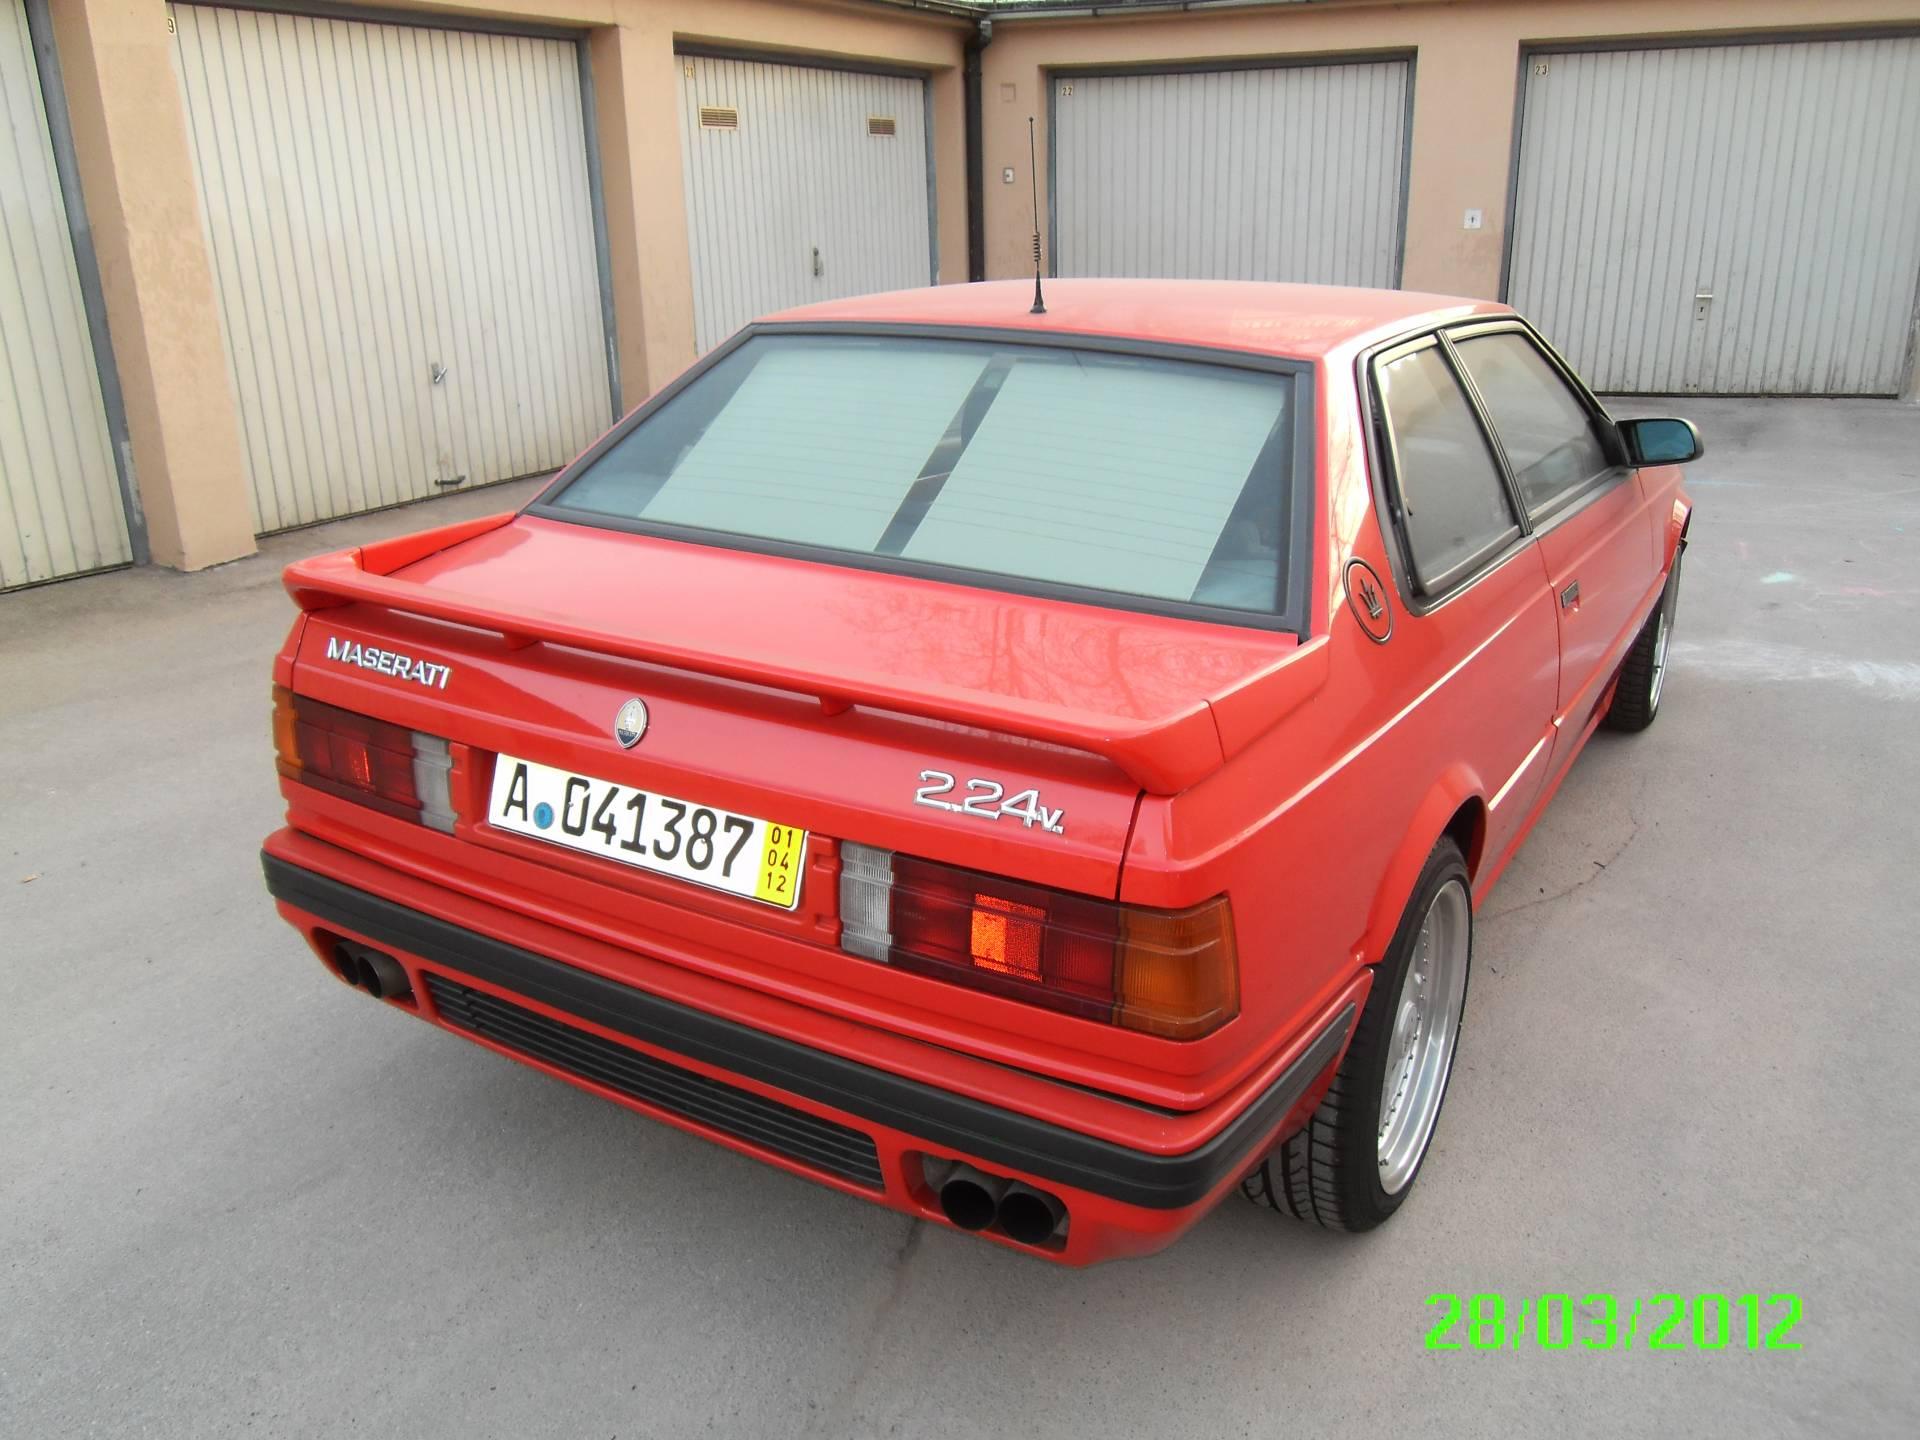 Maserati Biturbo 2.24V (1994) für 23.500 EUR kaufen